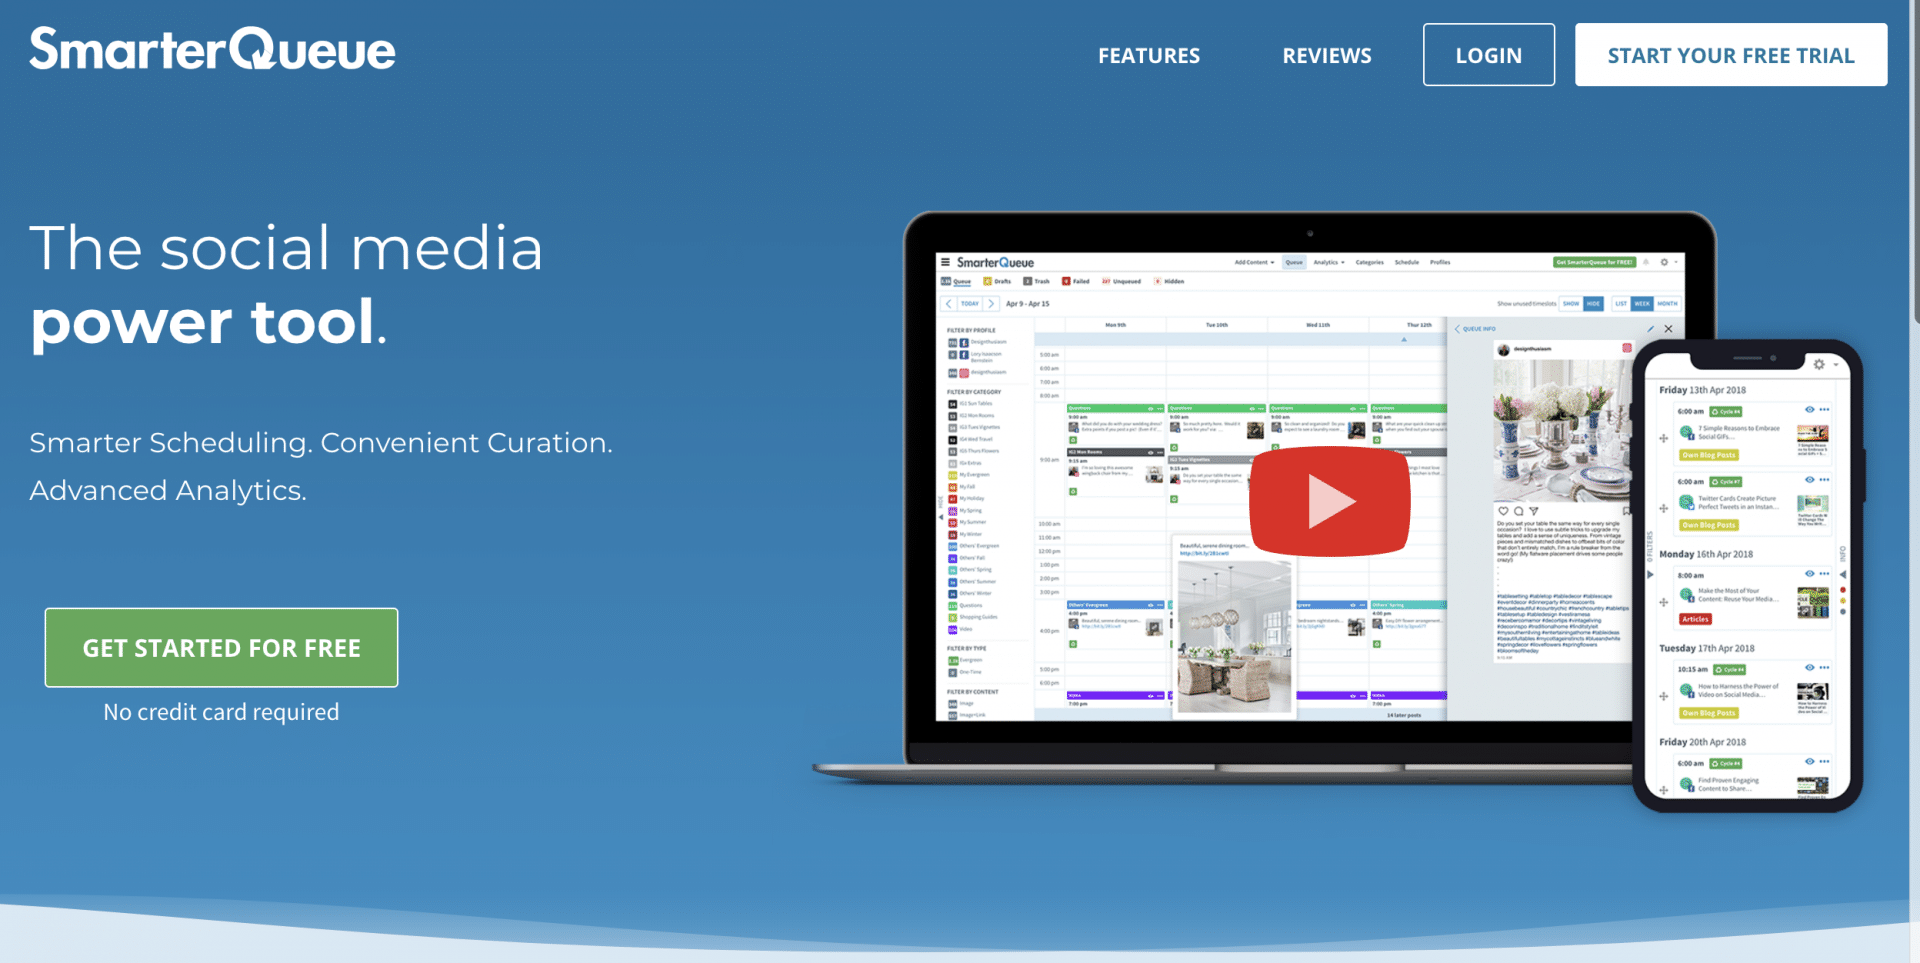 The SmarterQueue Home Page